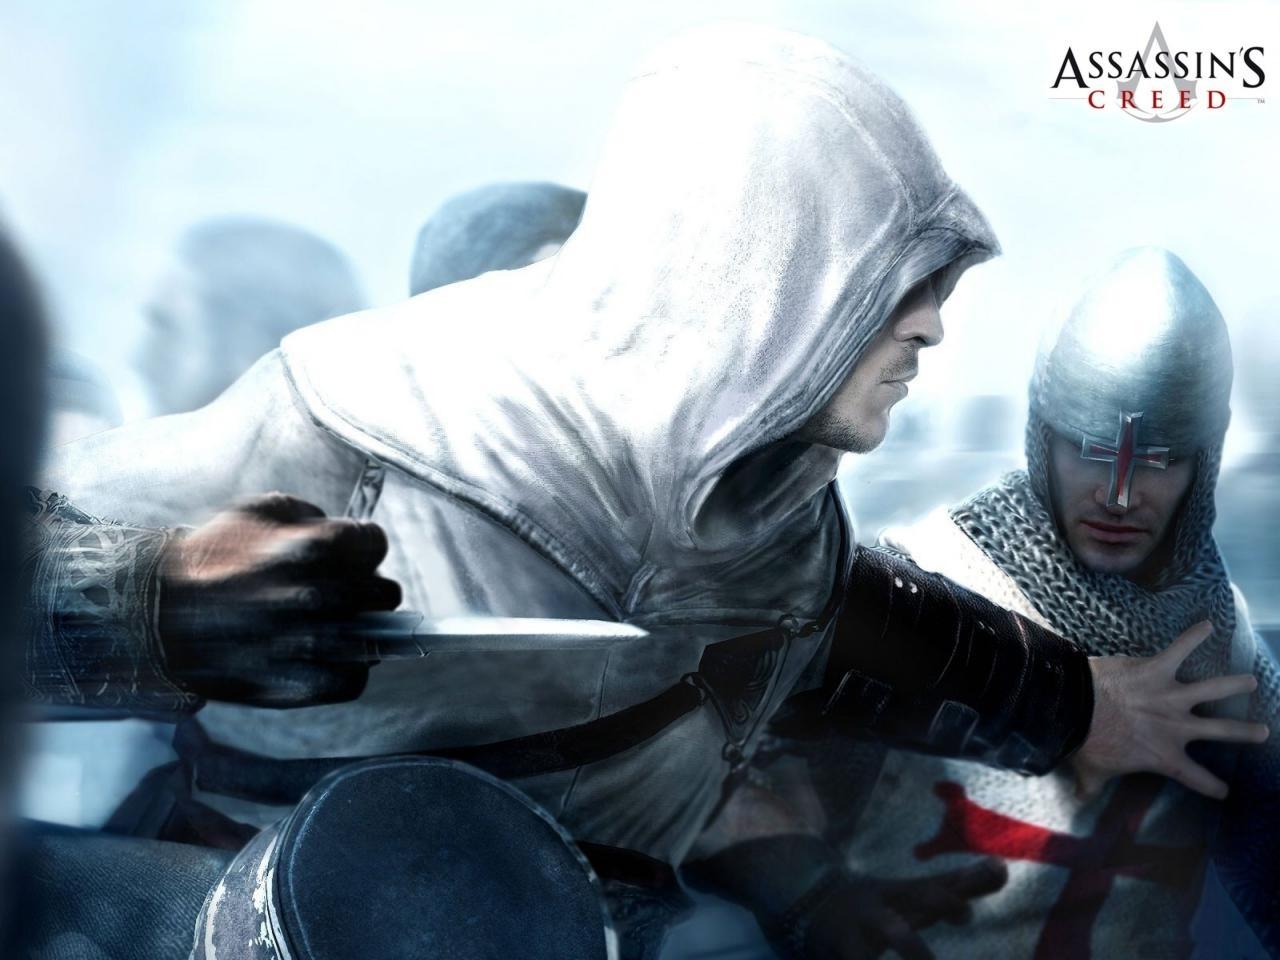 Assassins Creed Altair Wallpaper Customity 1280x960